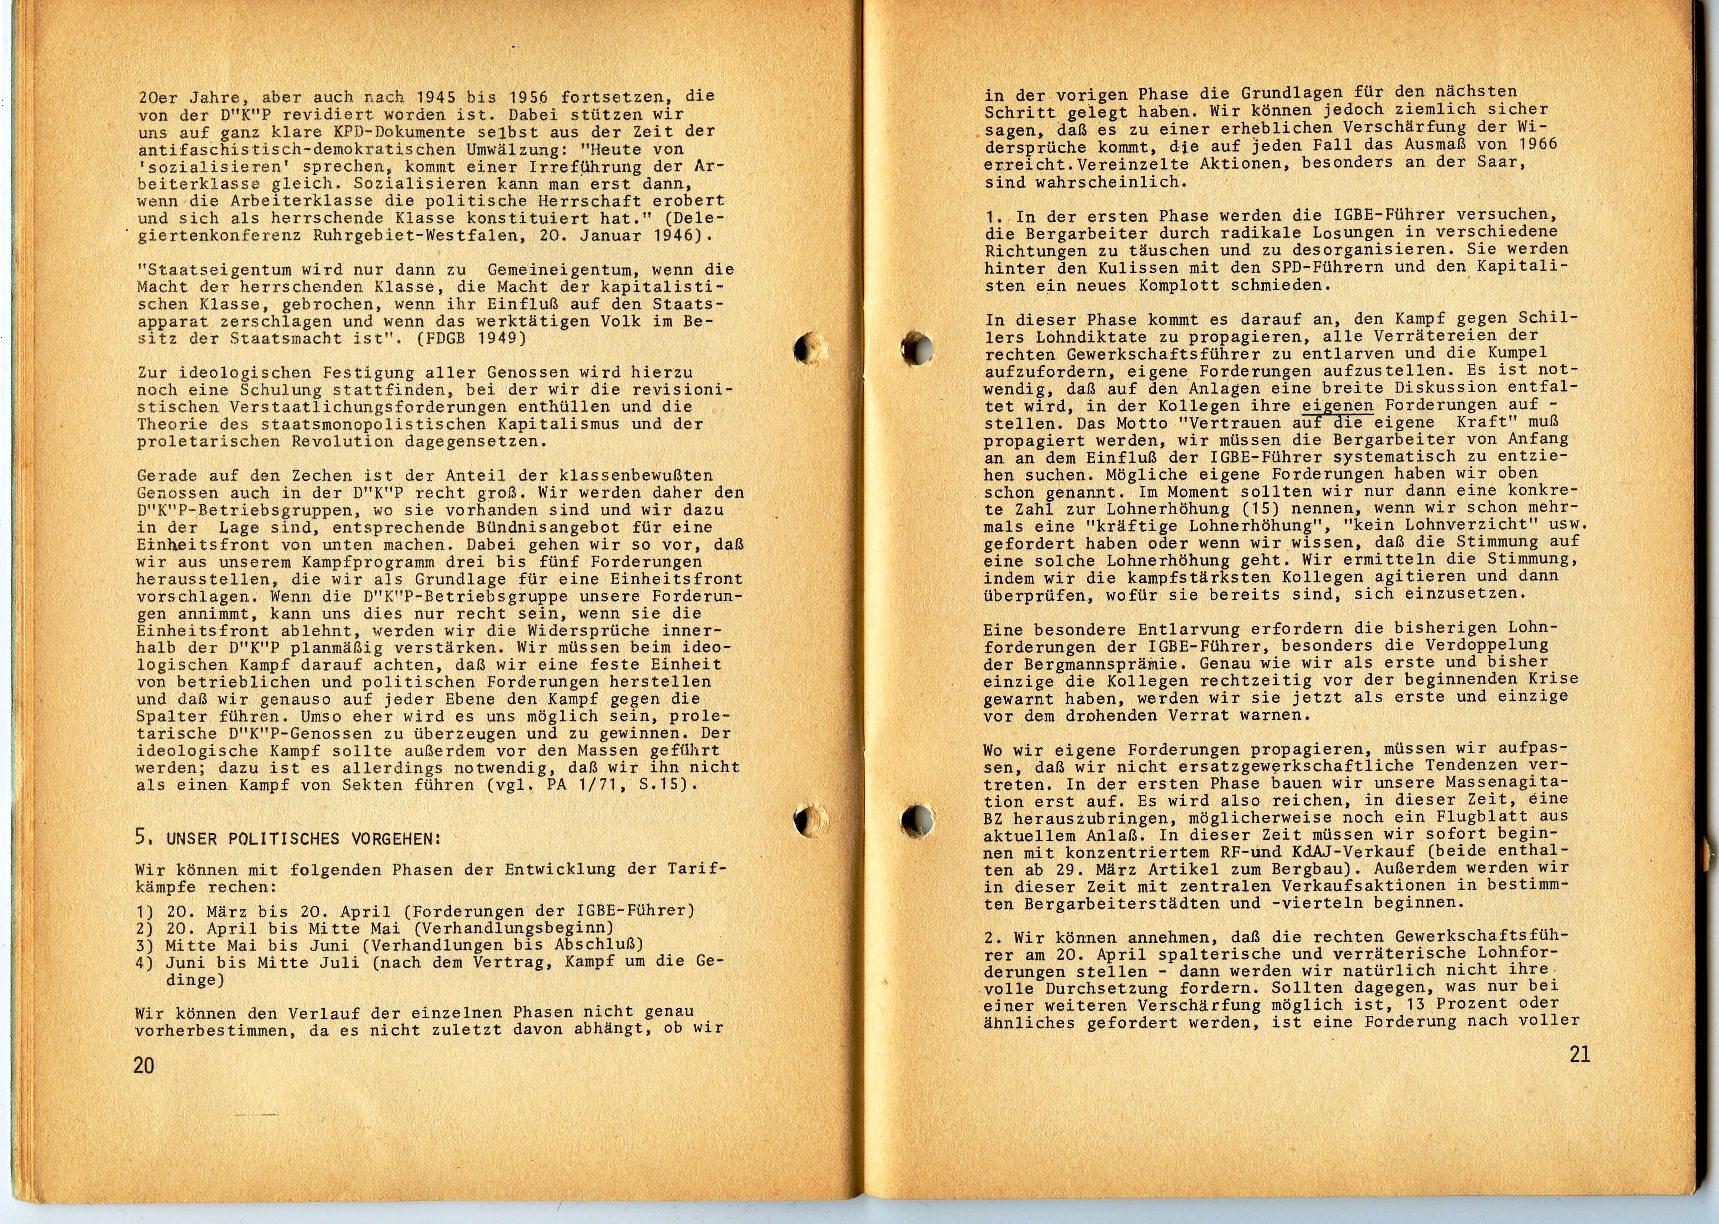 ZB_Parteiarbeiter_1971_04_11